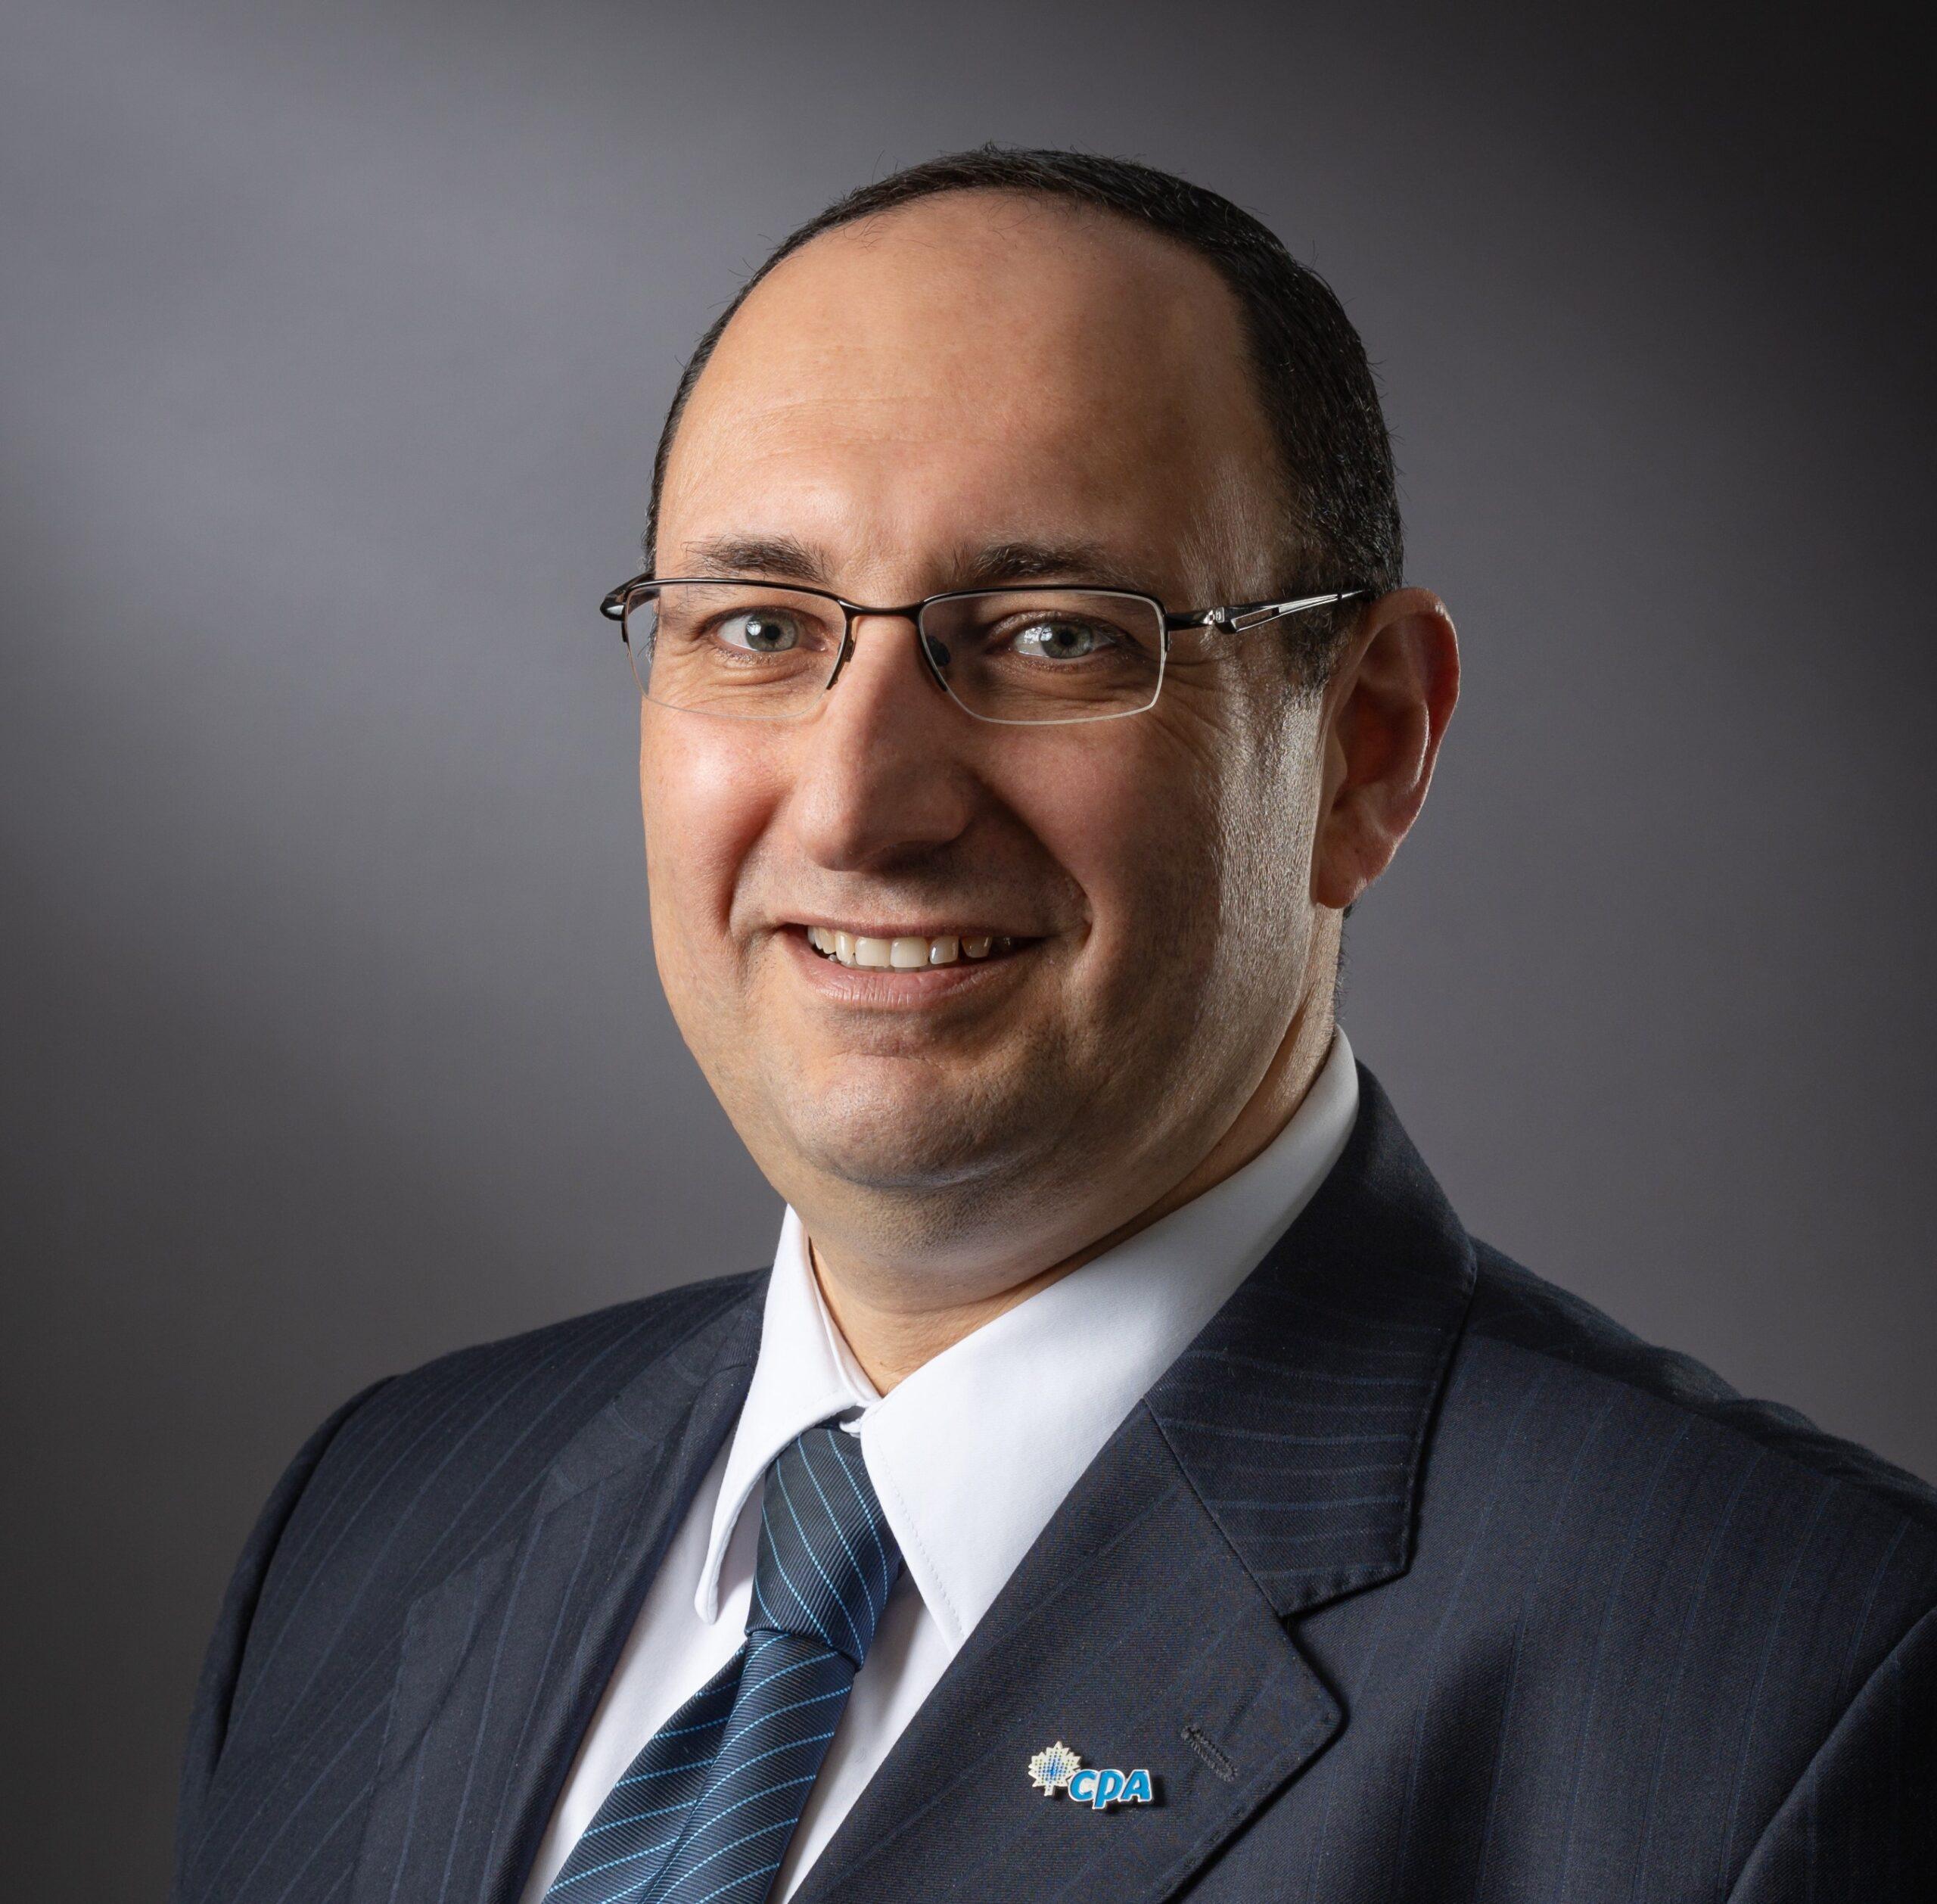 Prof. Dr. Sherif Elbarrad